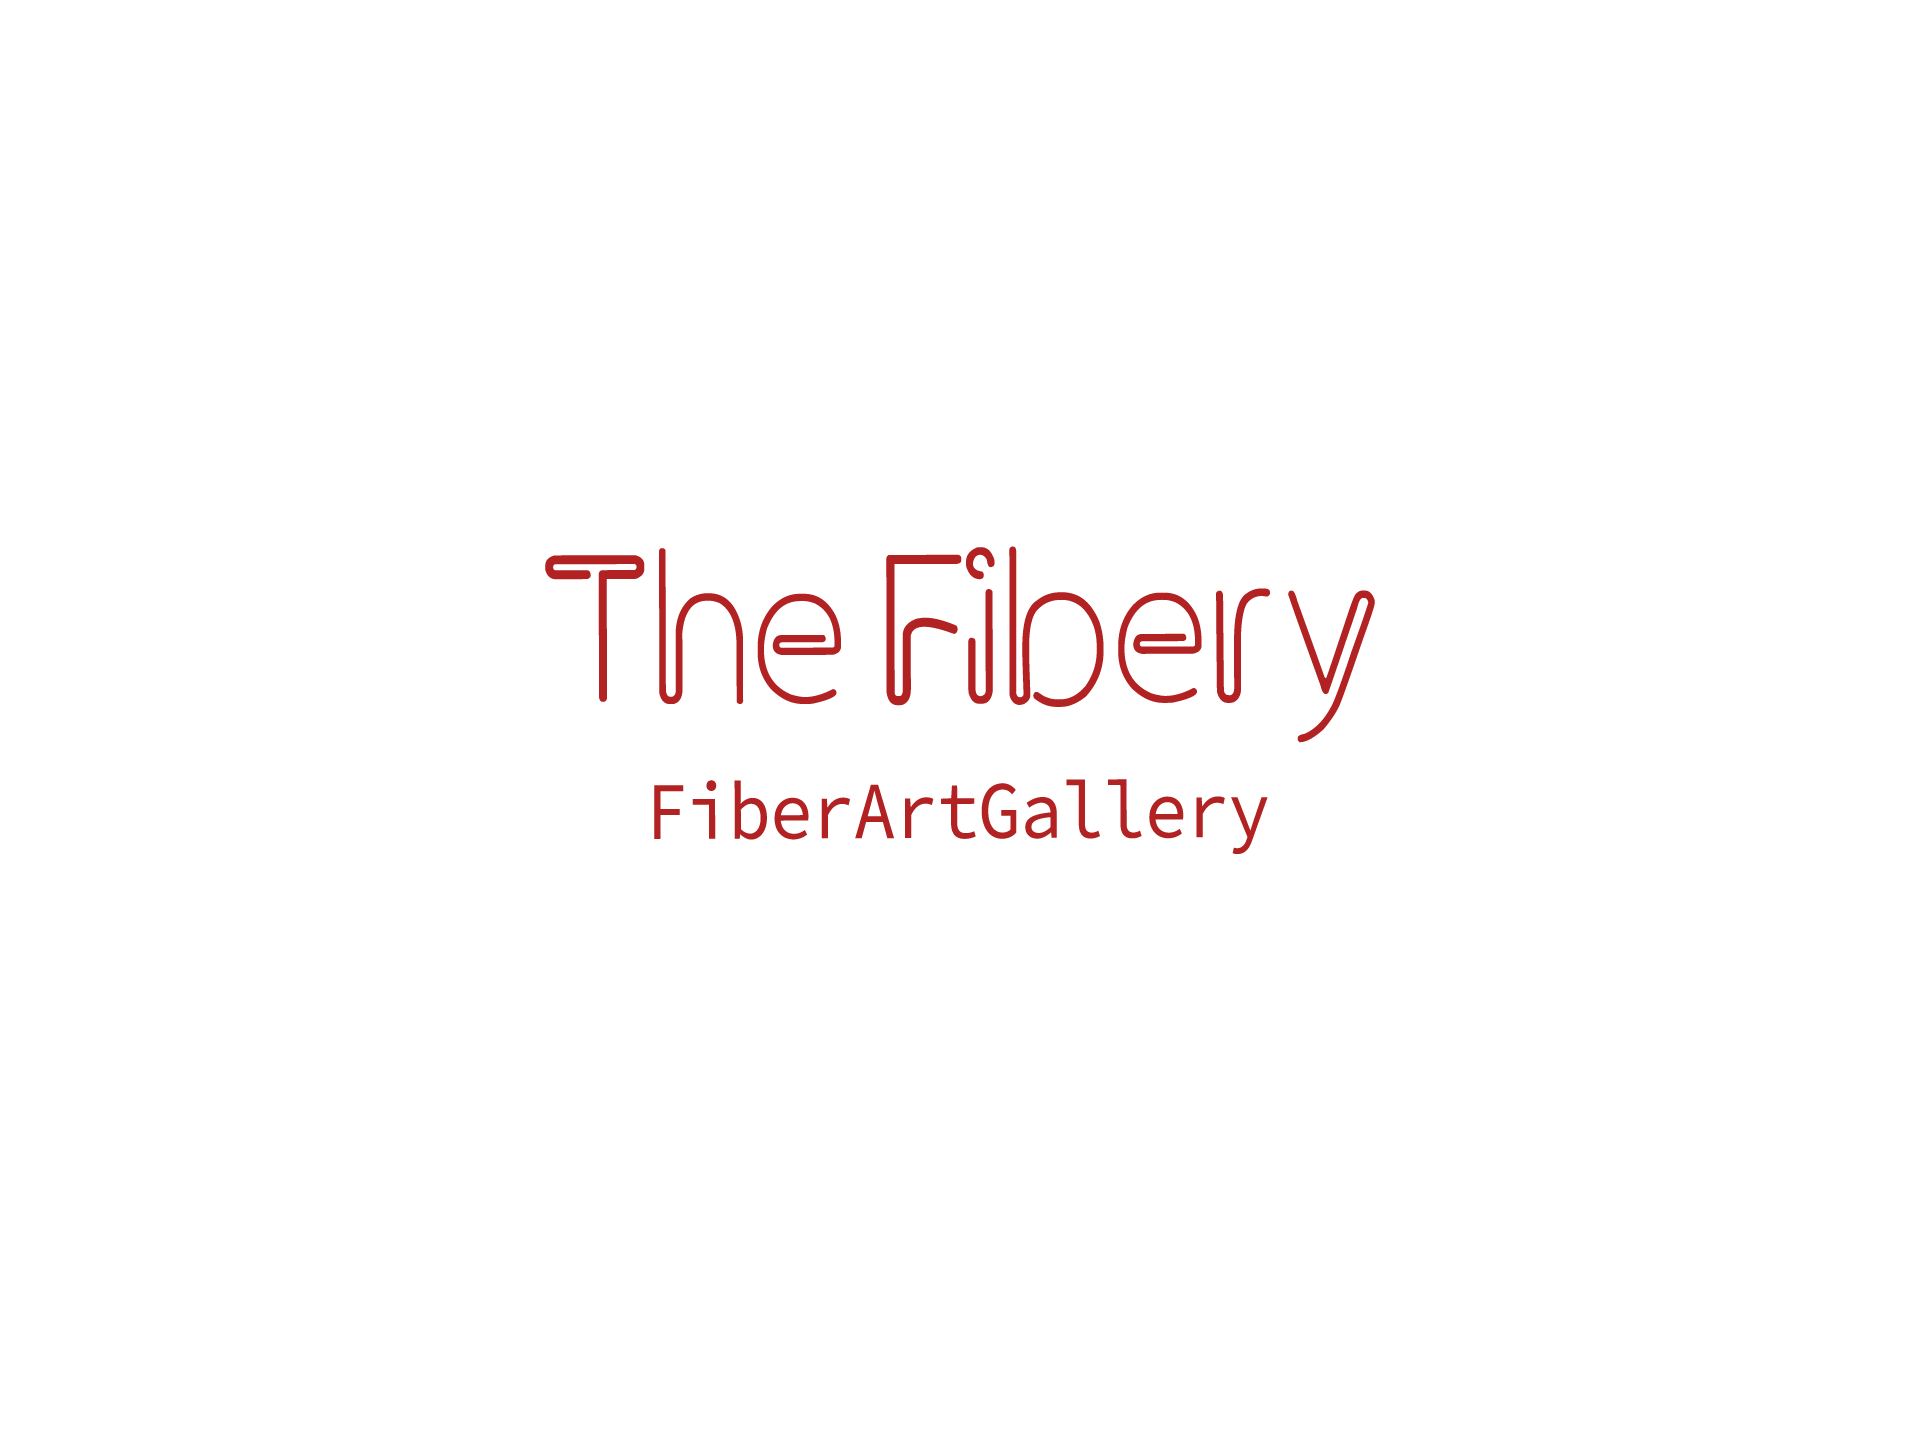 MiniLogorouge-The-Fibery.png